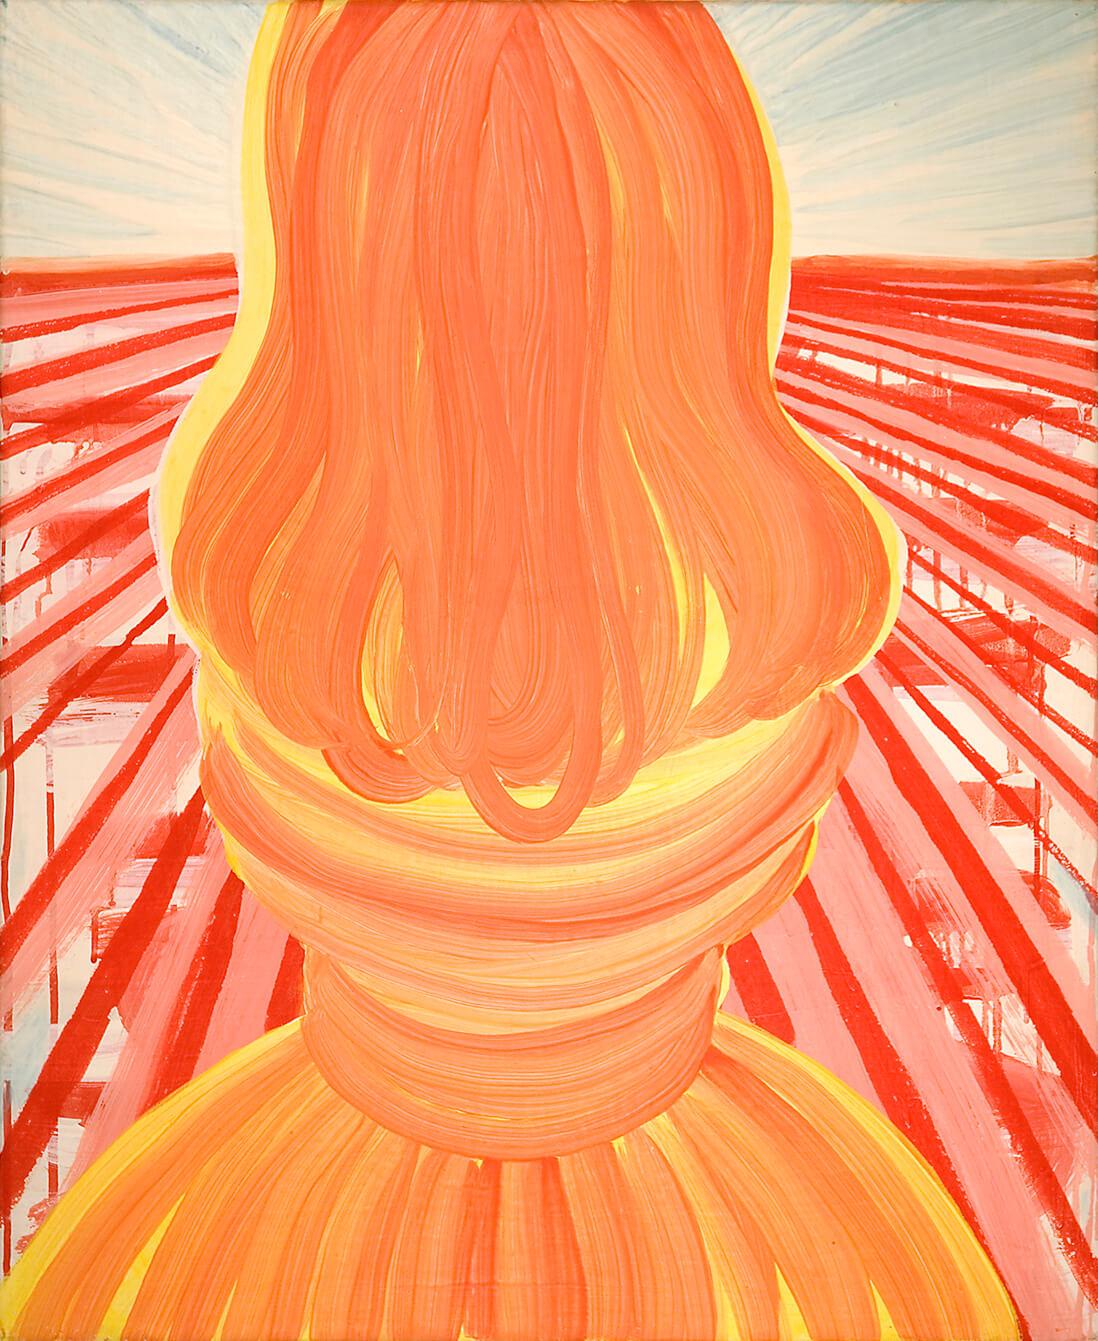 untitled (salt pillar), 73 x 60 cm, egg tempera on canvas, 2006